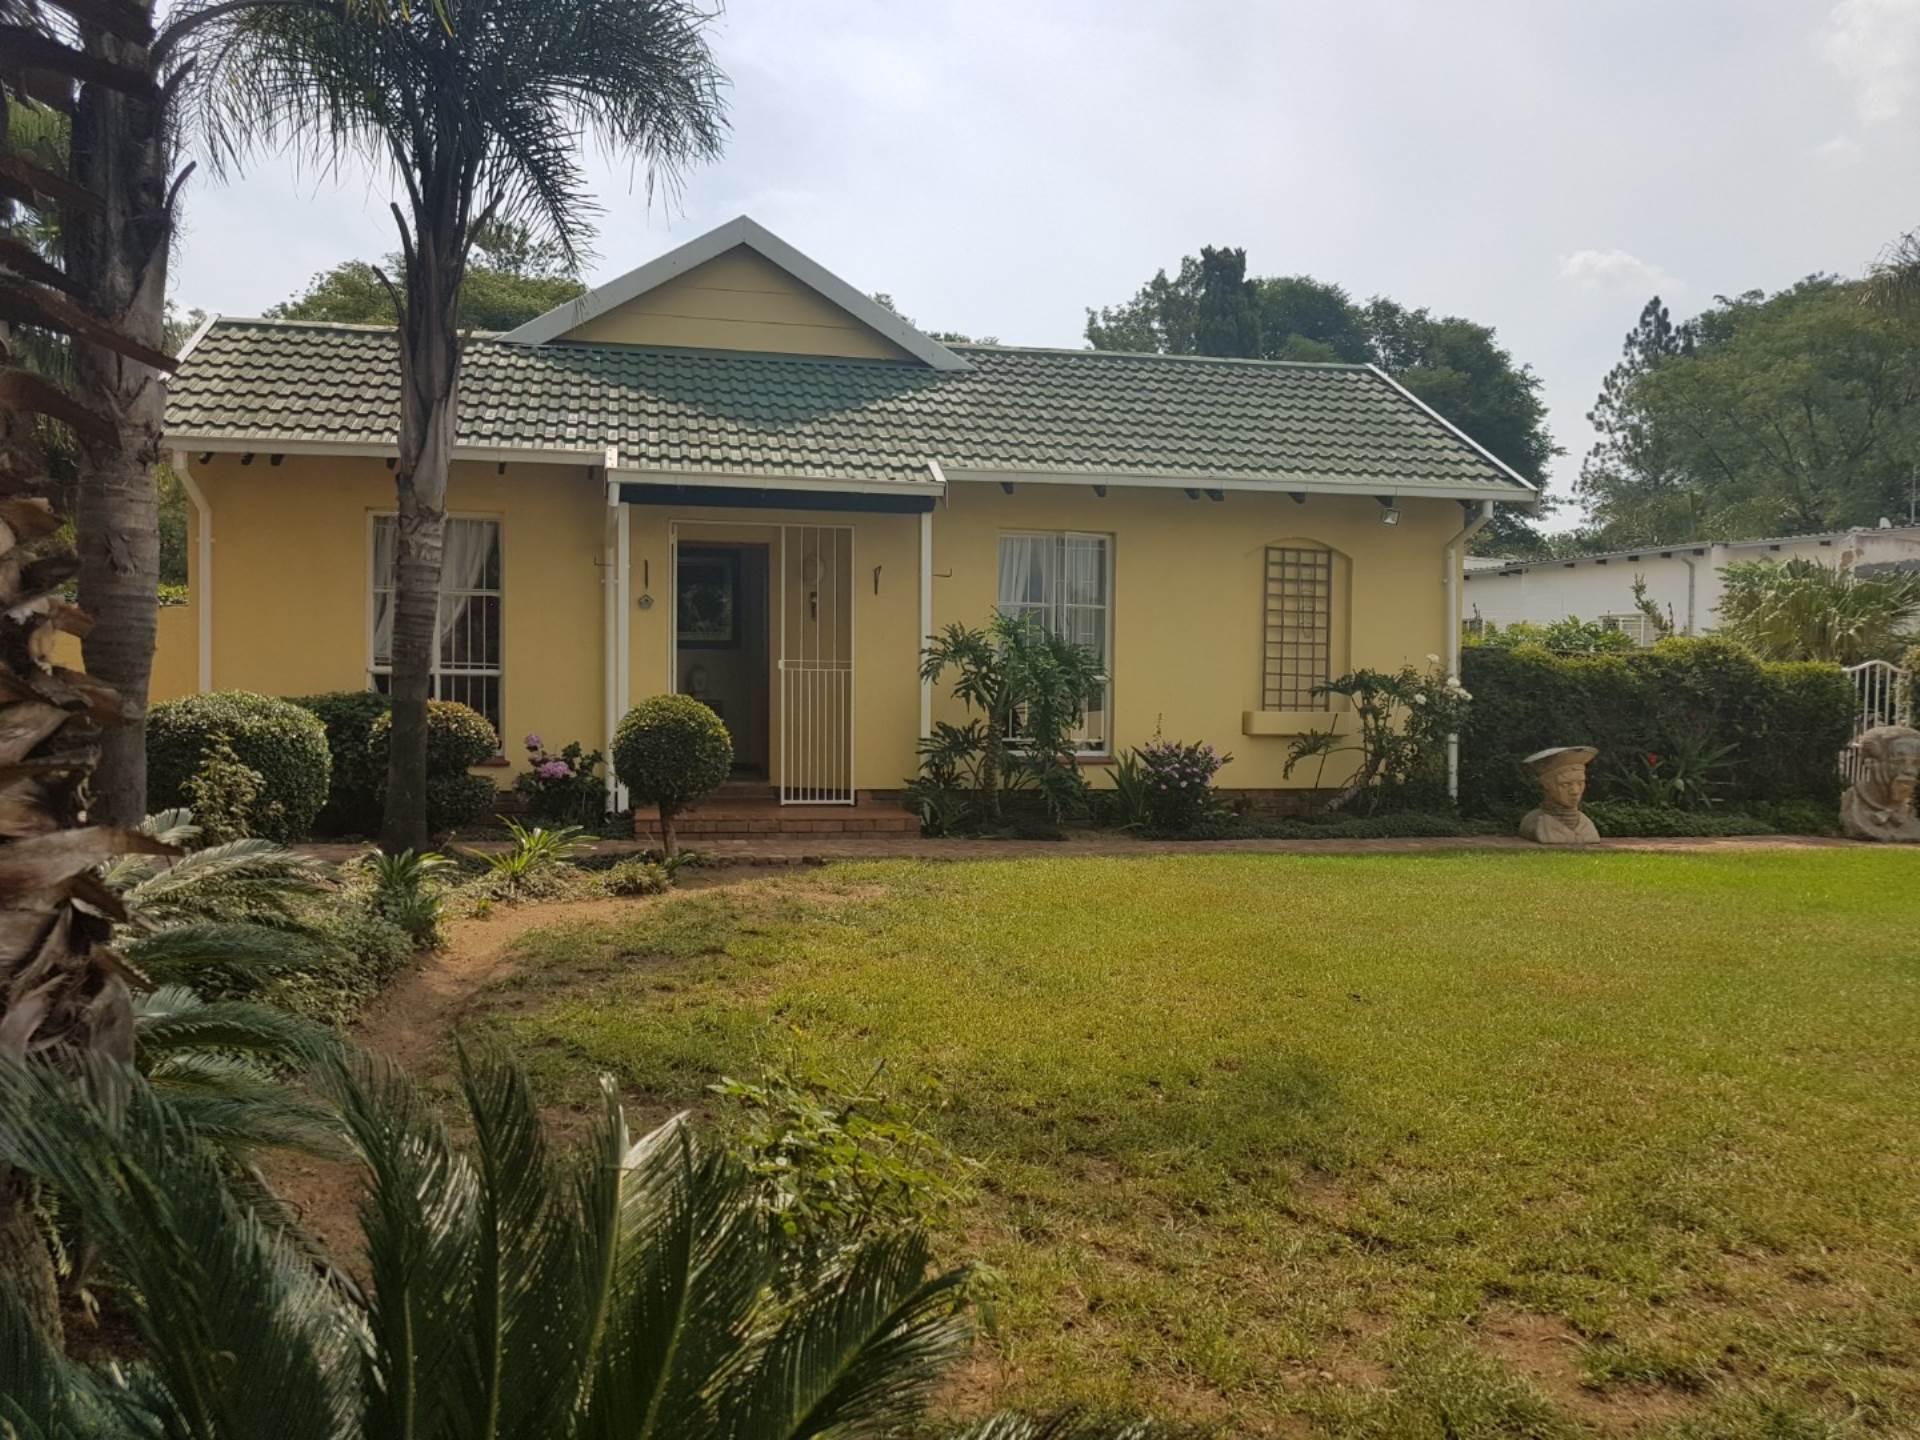 3 BedroomHouse To Rent In Jukskei Park